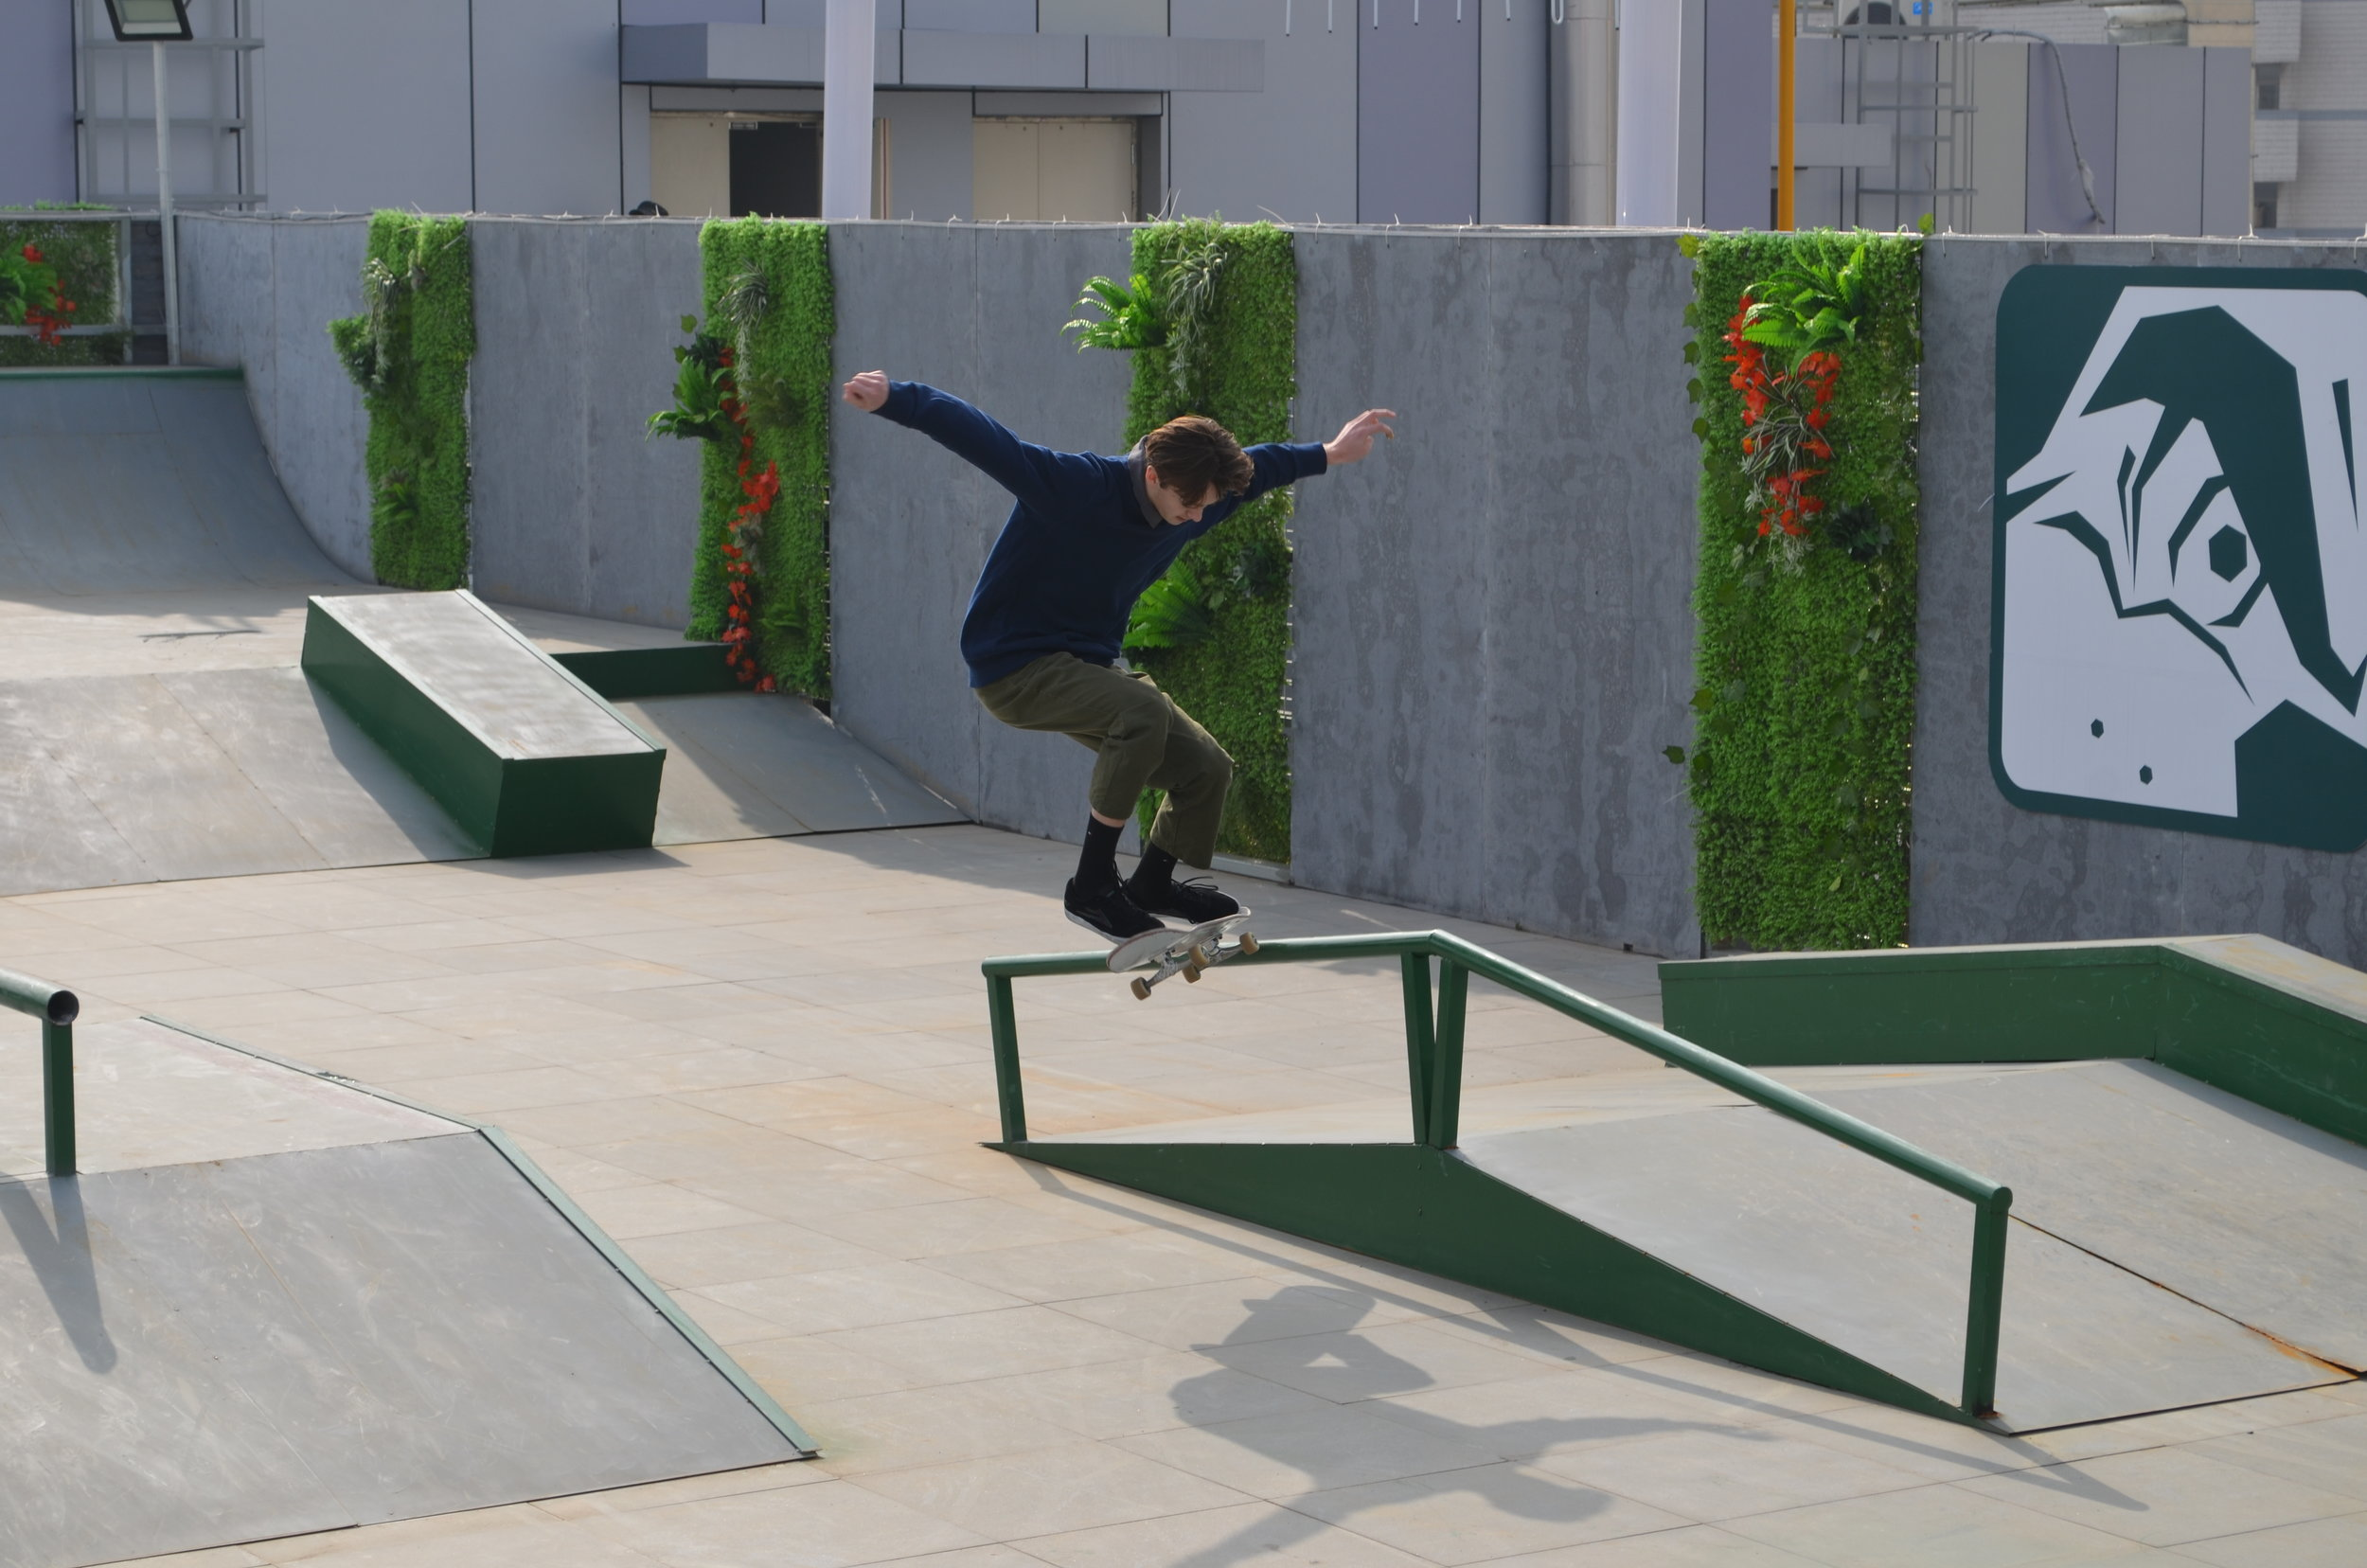 Dogtown-skatepark-nanjing-5